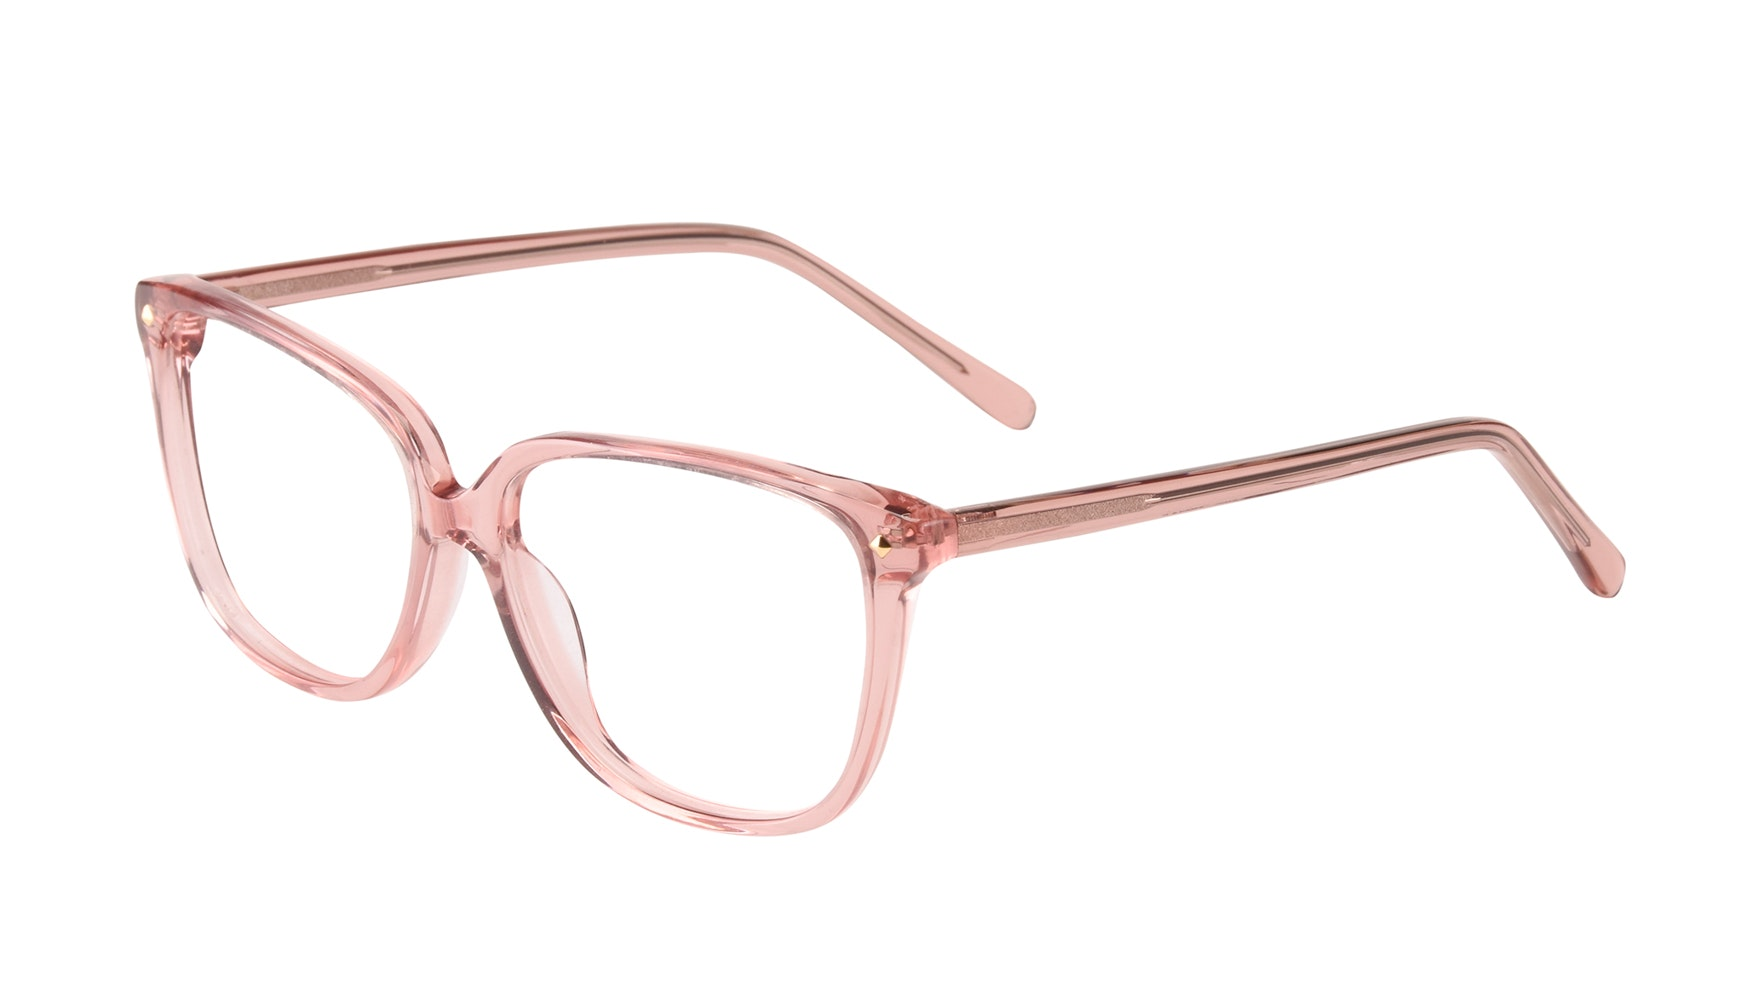 Affordable Fashion Glasses Rectangle Square Eyeglasses Women Muse Rose Tilt